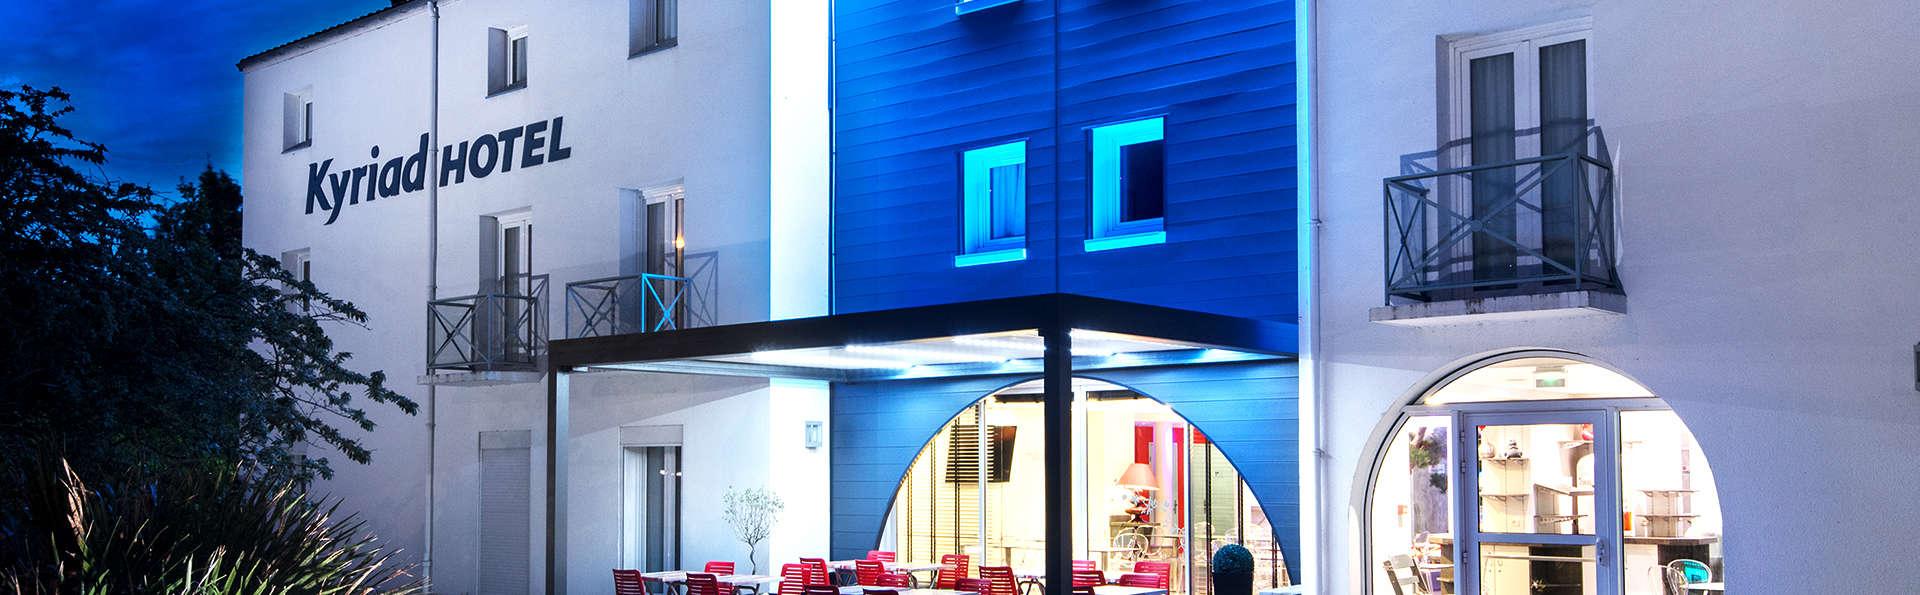 Hotel Kyriad La Rochelle Centre Ville - EDIT_Exterior.jpg